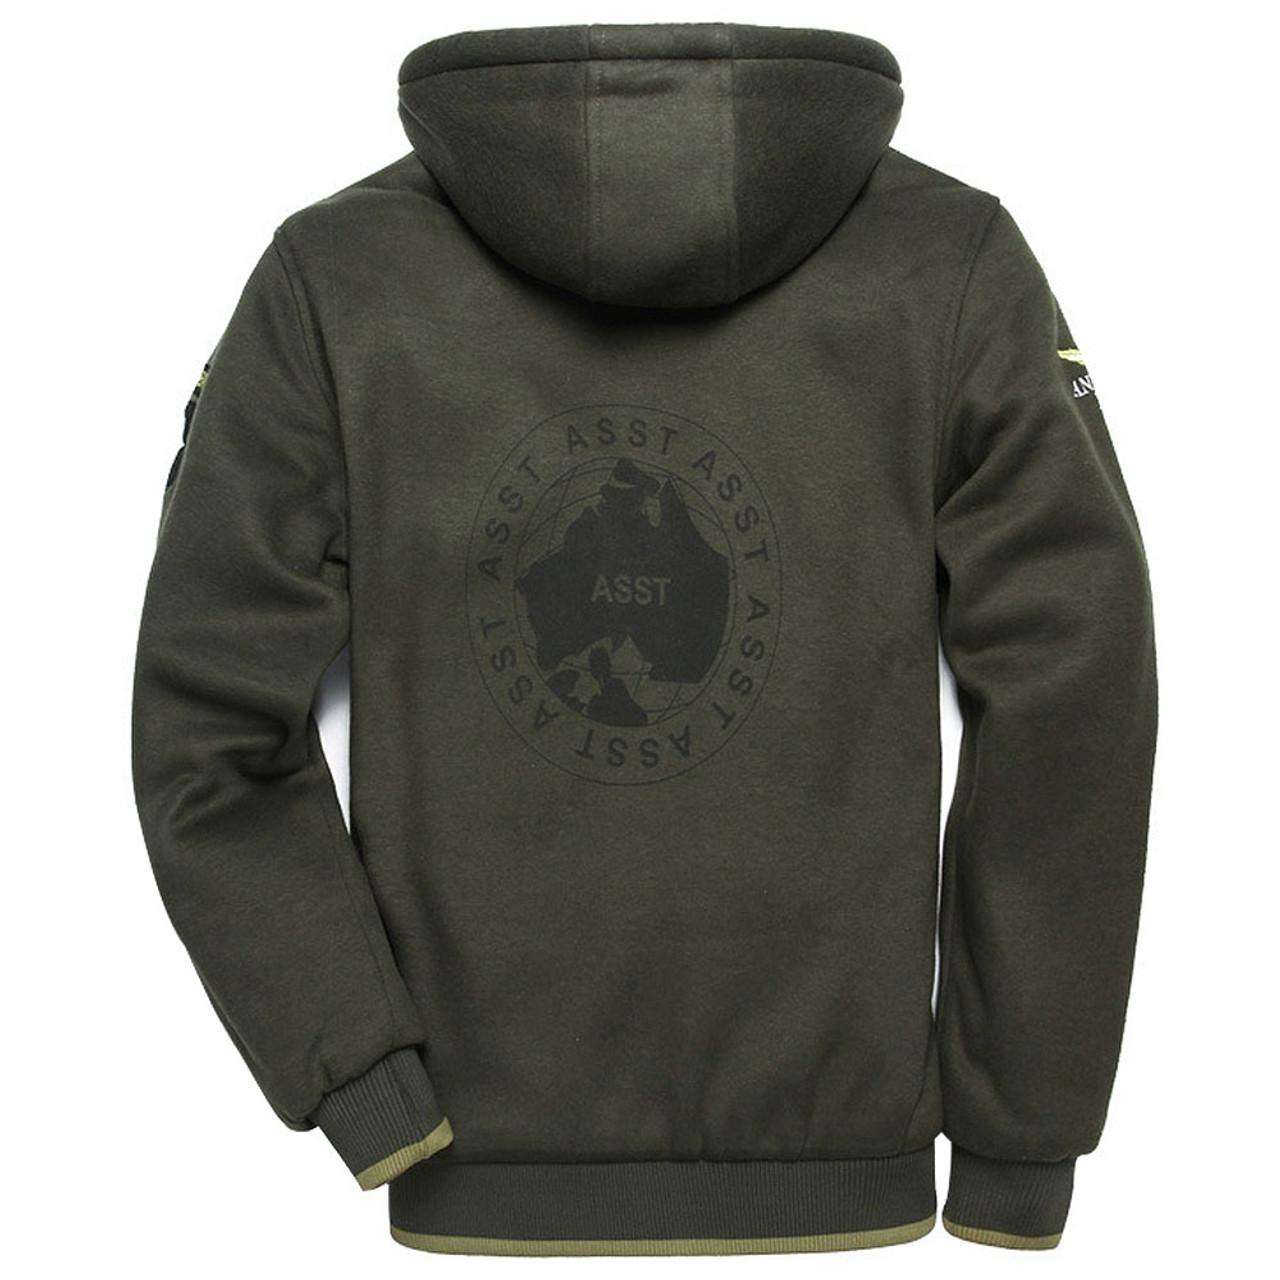 fe6e0c4b9e4 ... MYDBSH 3XL 2018 Wool warm winter coats mens hoodies and sweatshirts  Cardigan jackets Clothes wear uniform ...